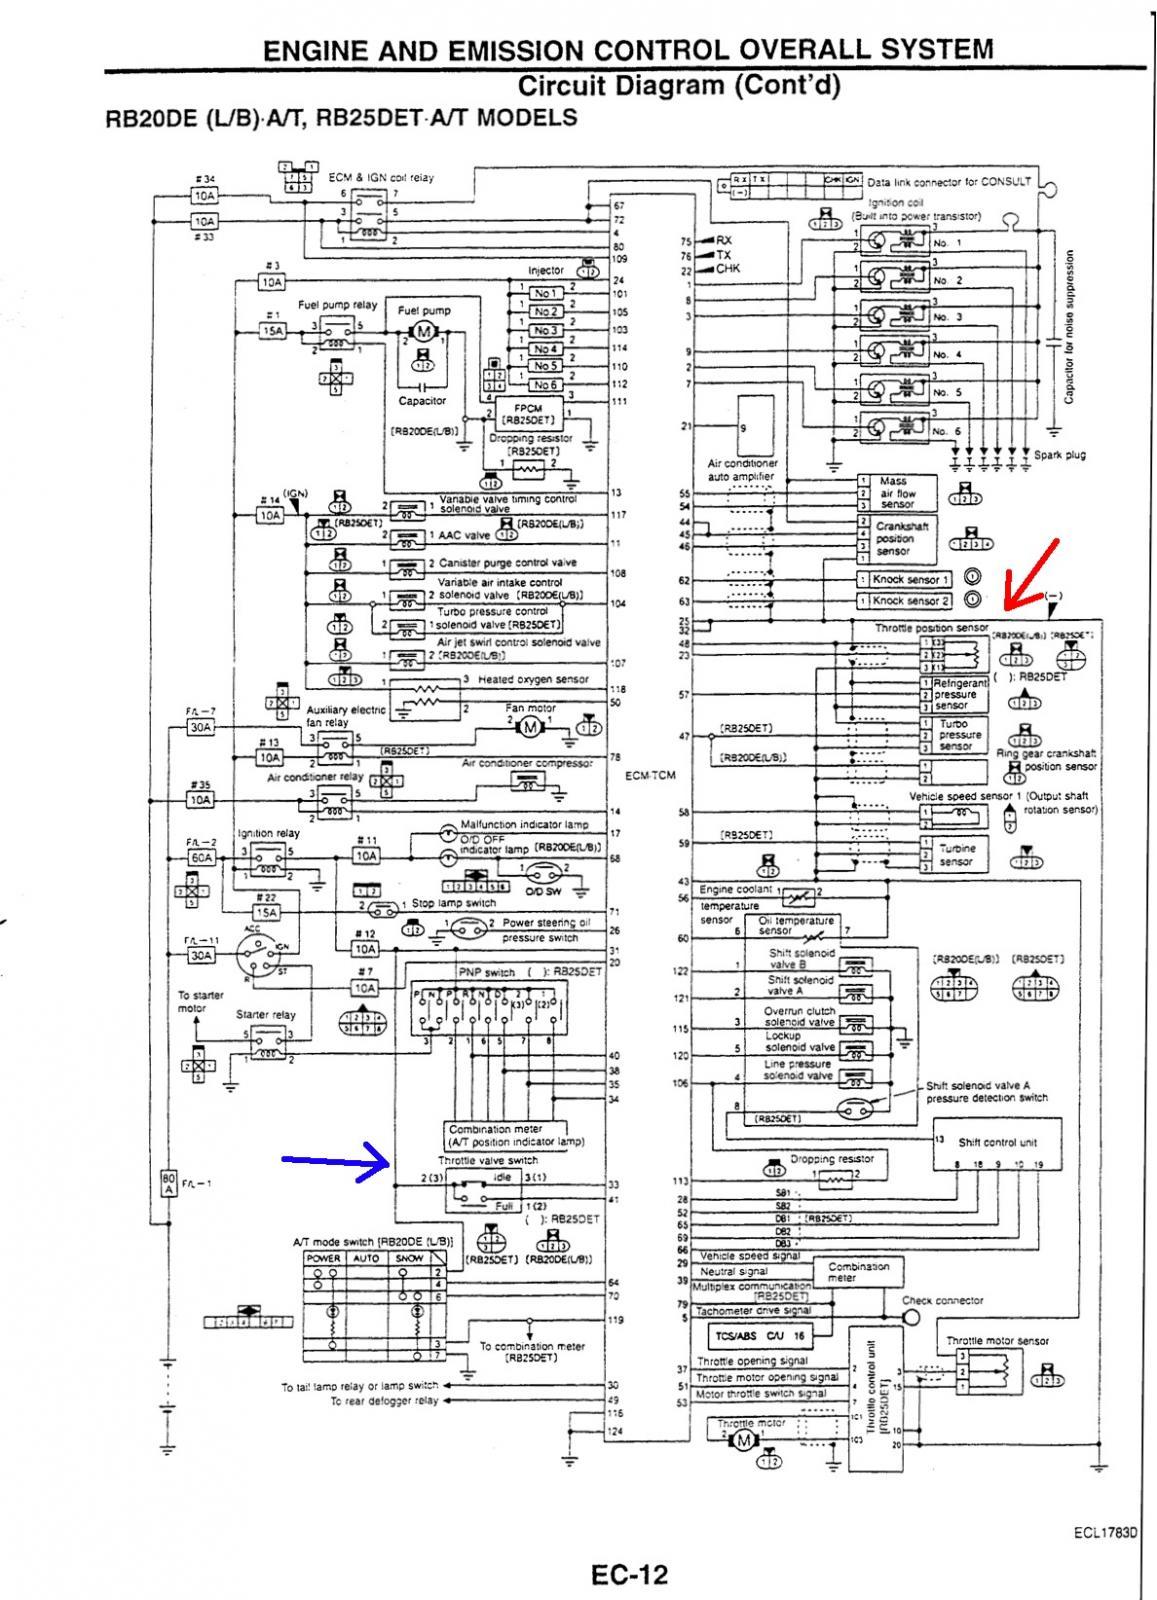 rb20det engine wiring diagram nissan rb20 wiring diagram  wiring diagram